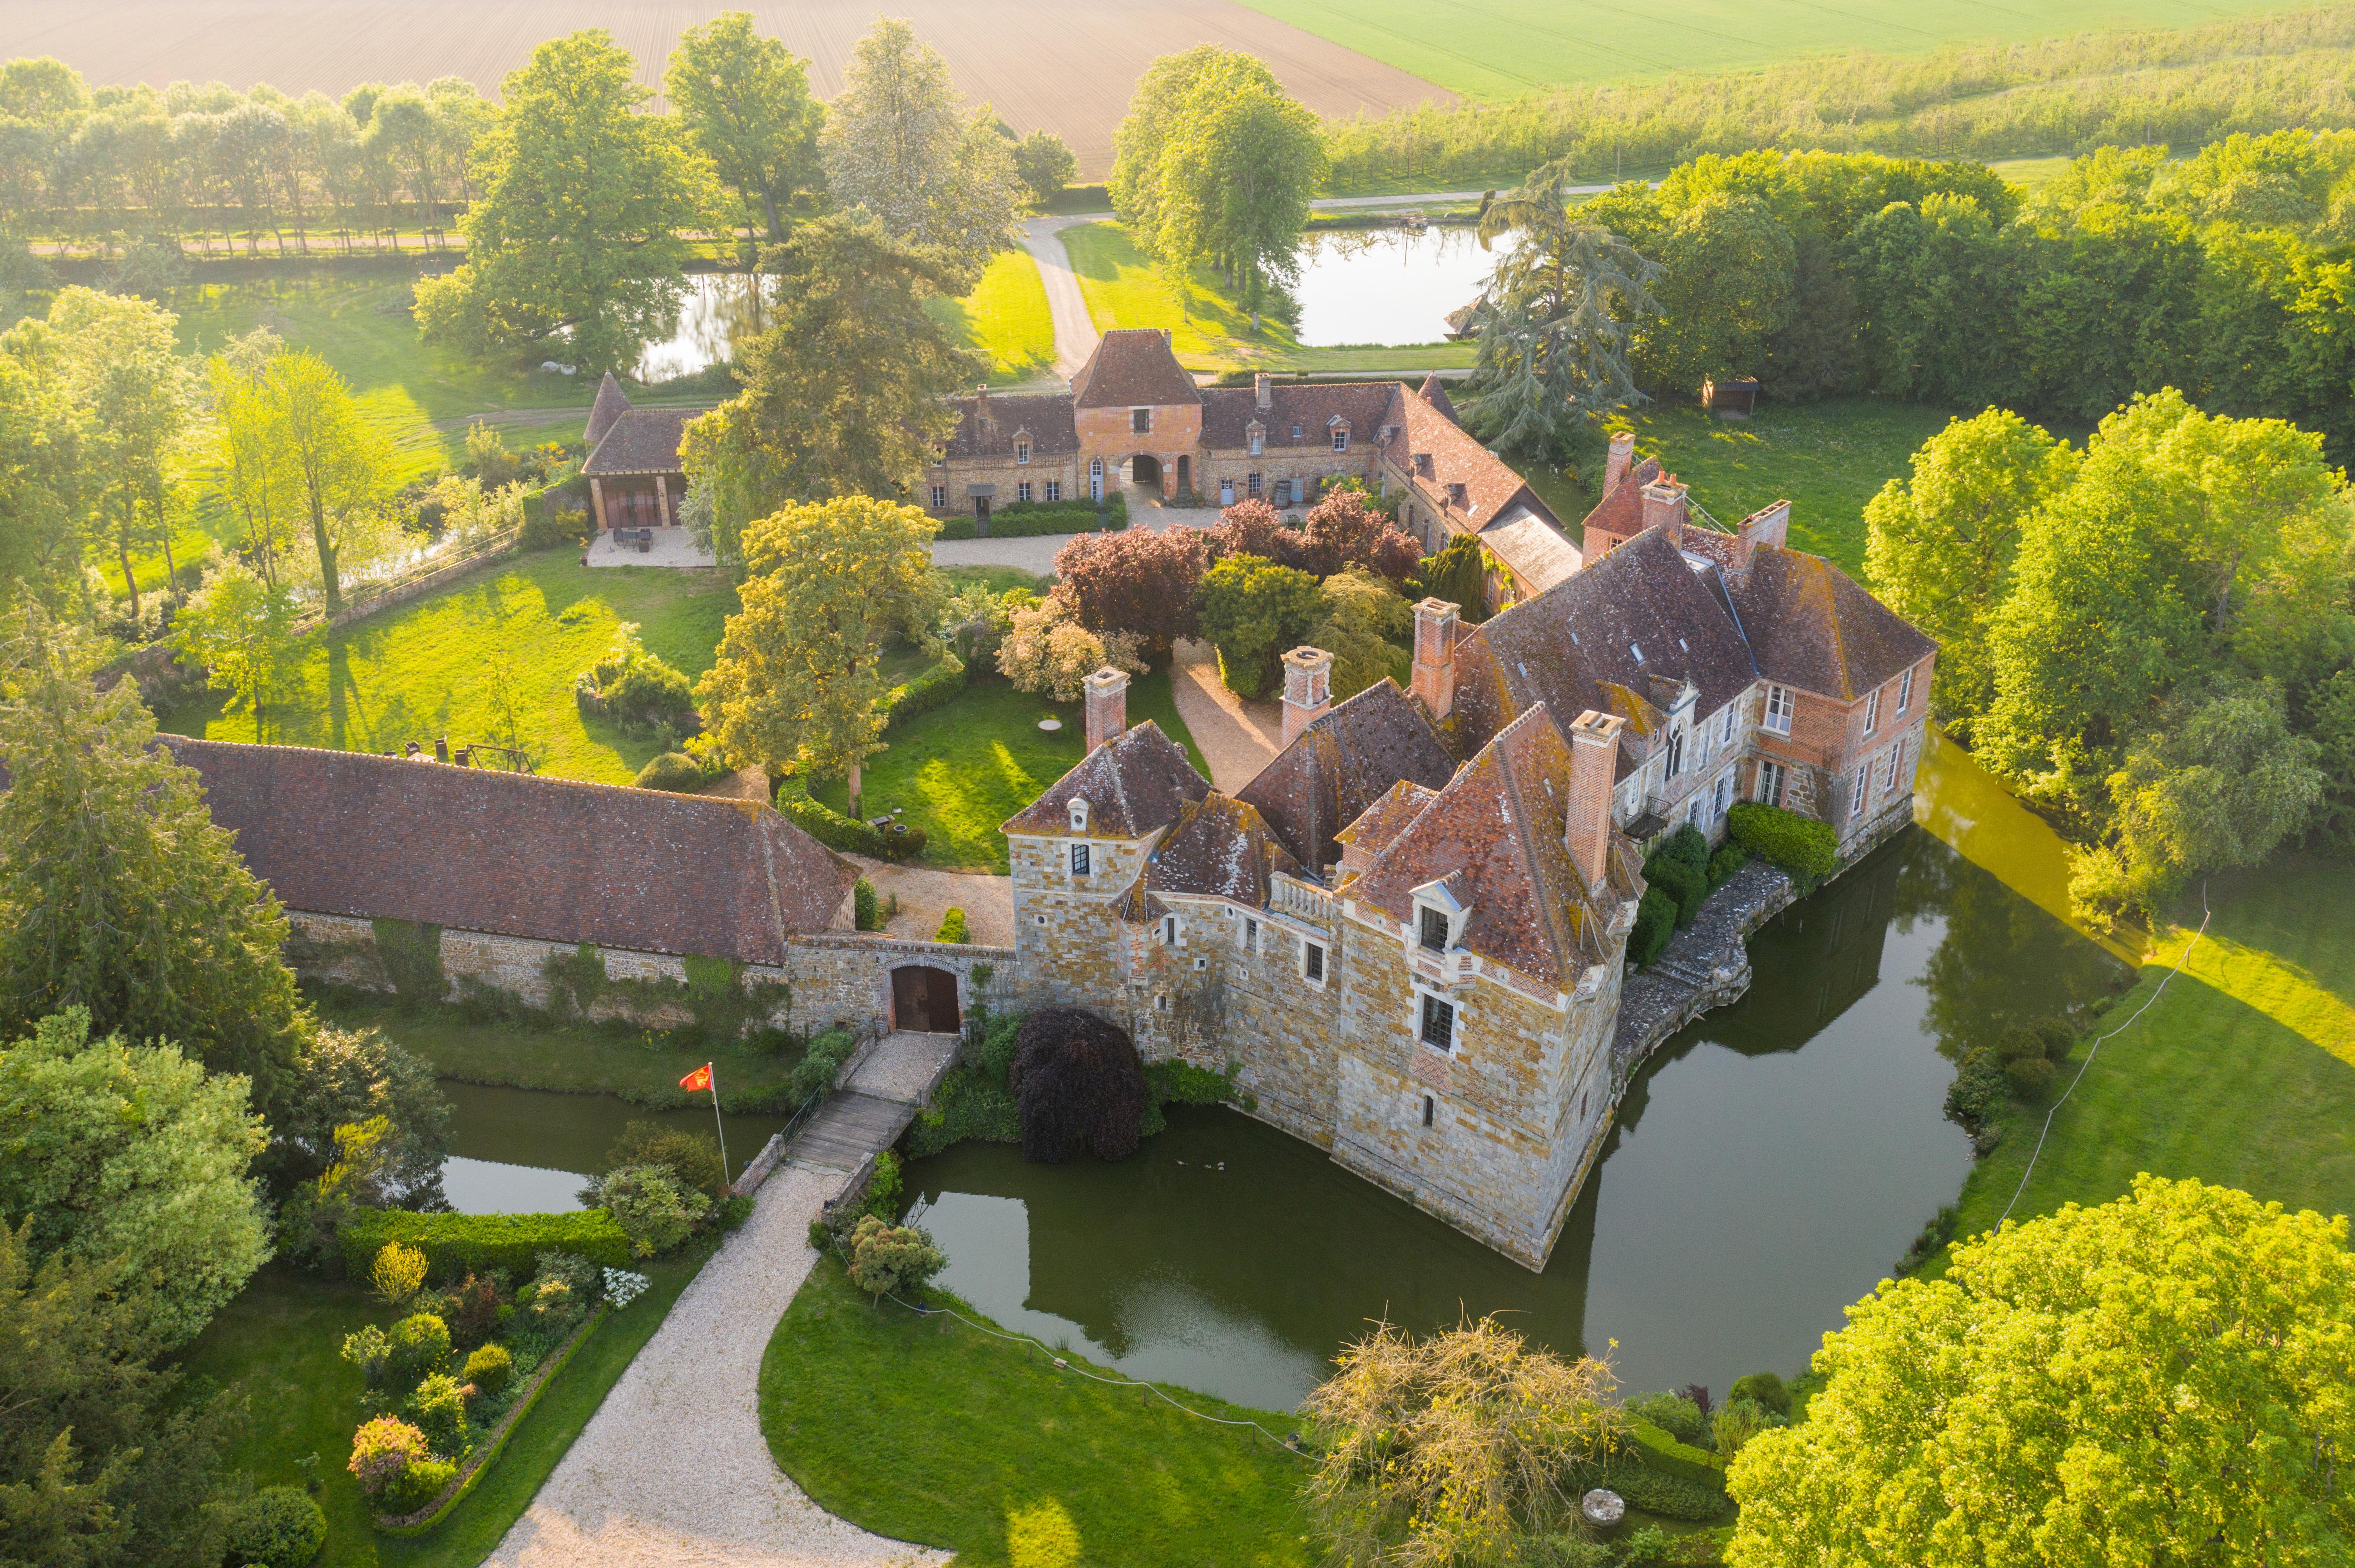 Château du Blanc Buisson by Romain Reglade